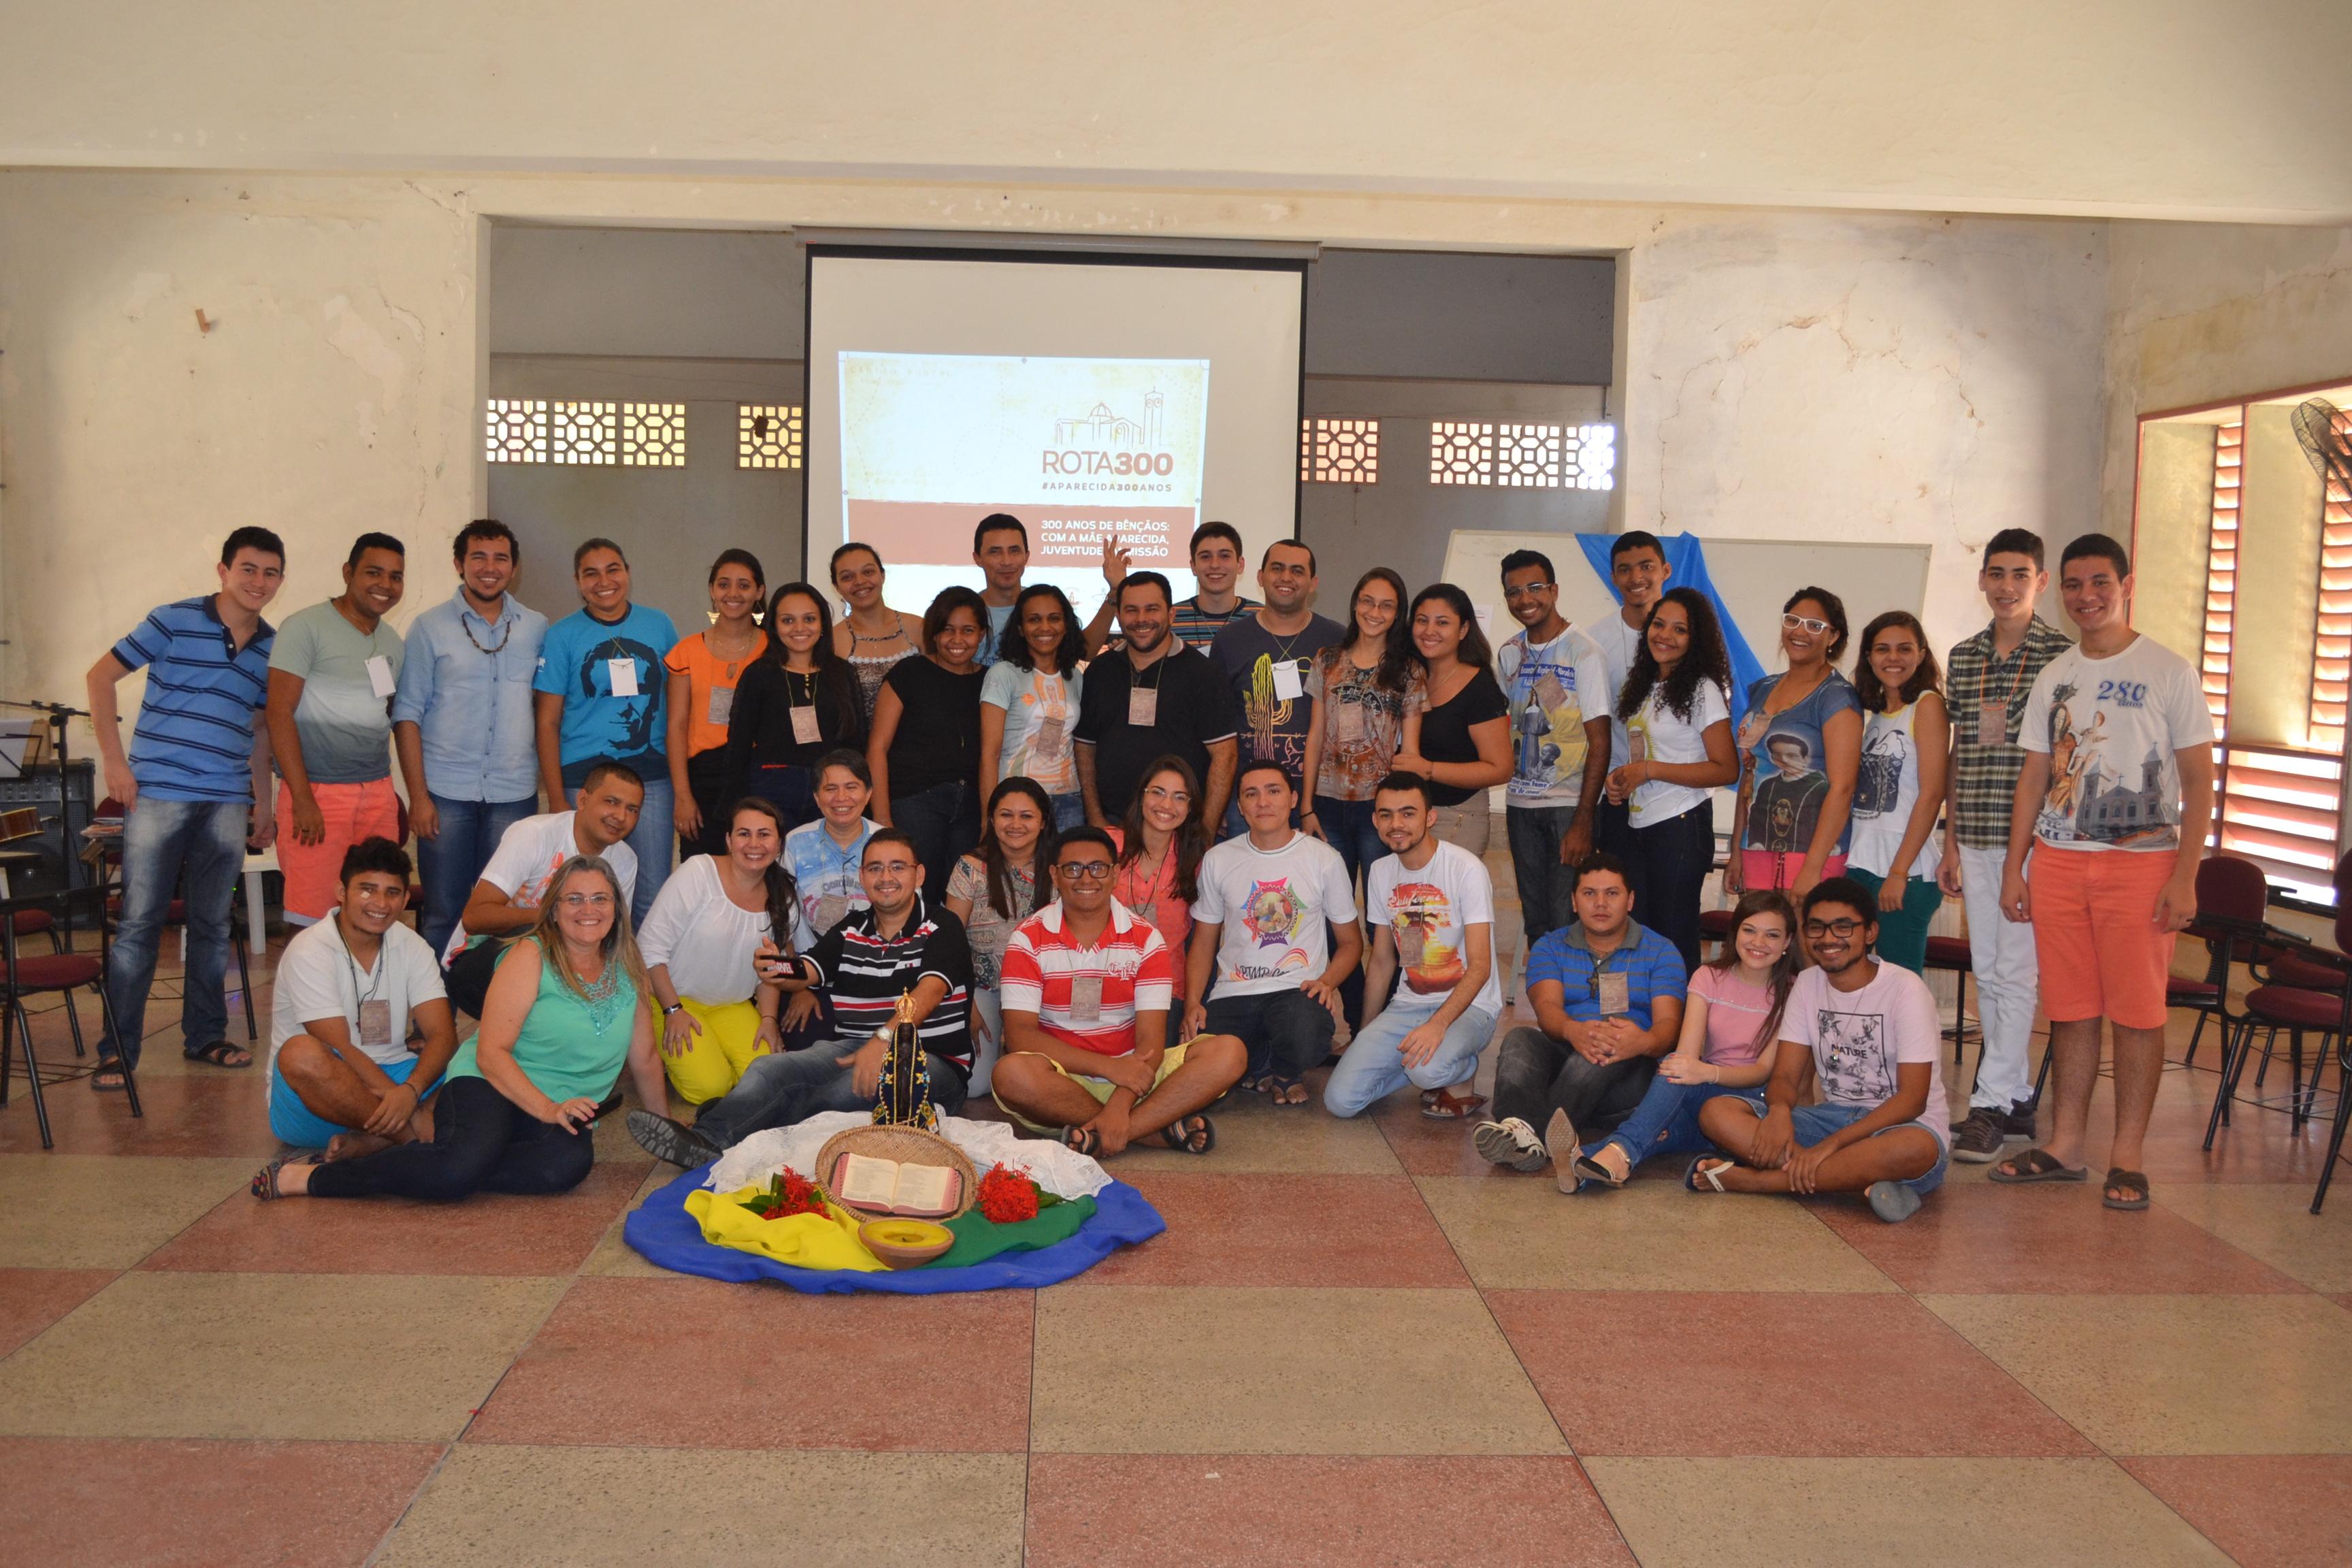 Assembleia da Juventude reúne líderes da Diocese de Limoeiro do Norte, no Ceará